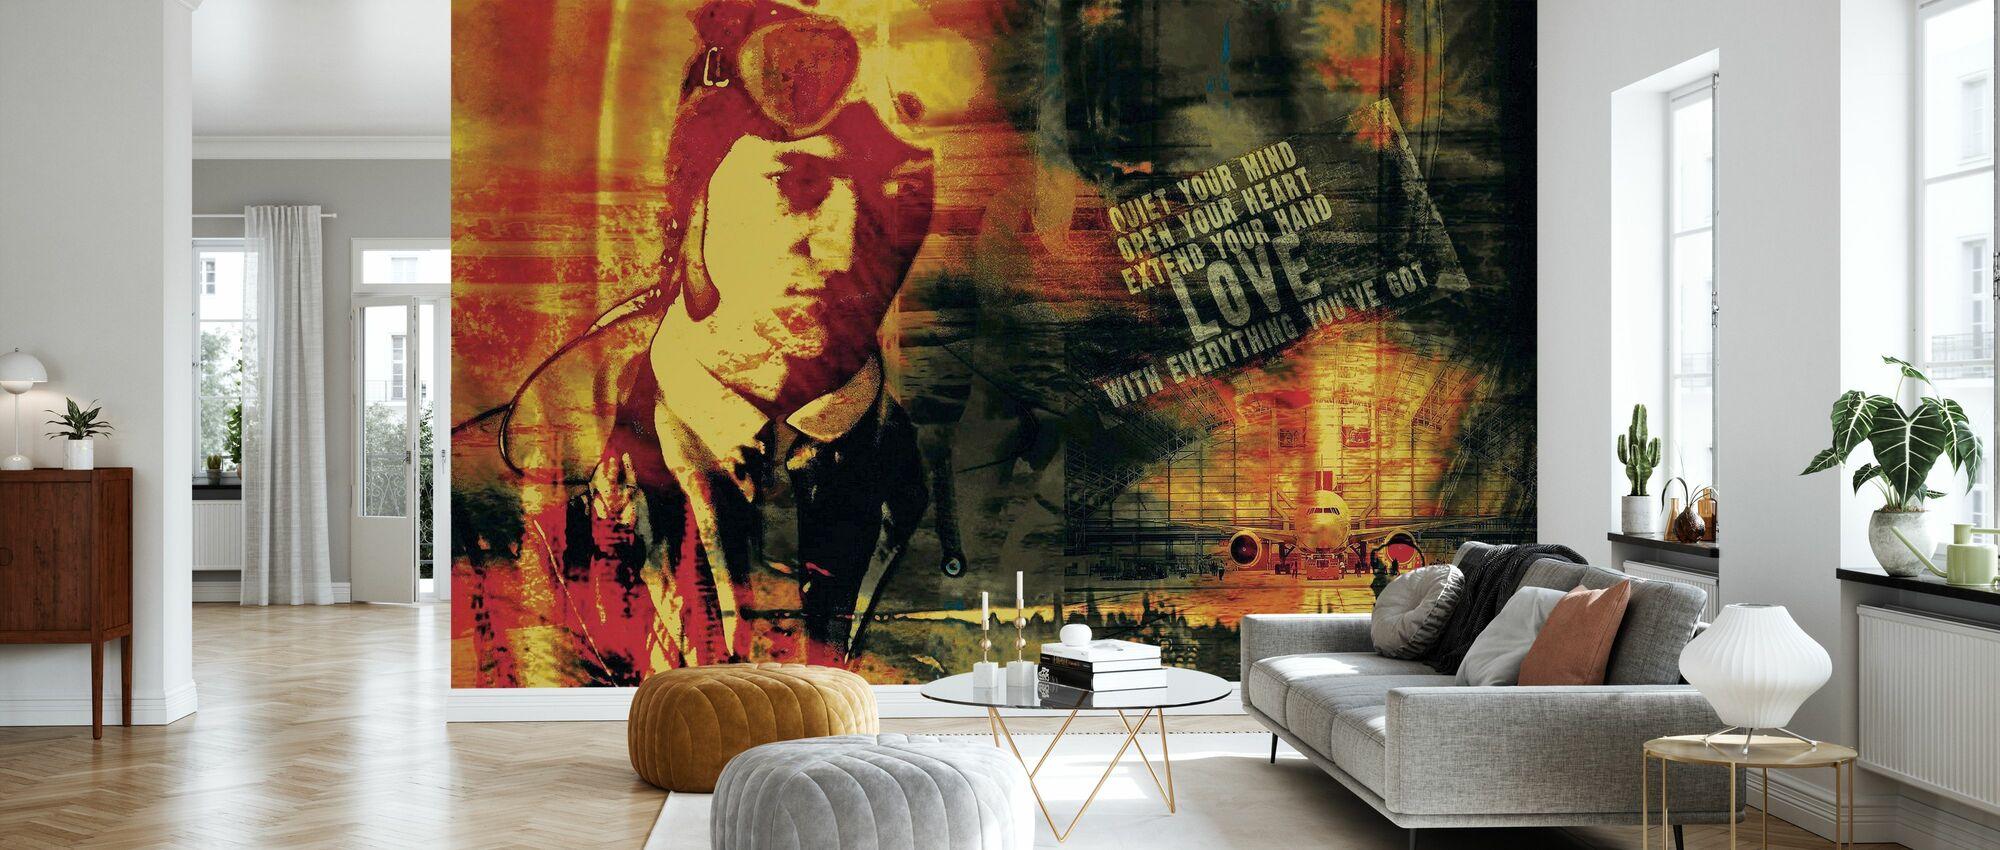 Old School - Wallpaper - Living Room